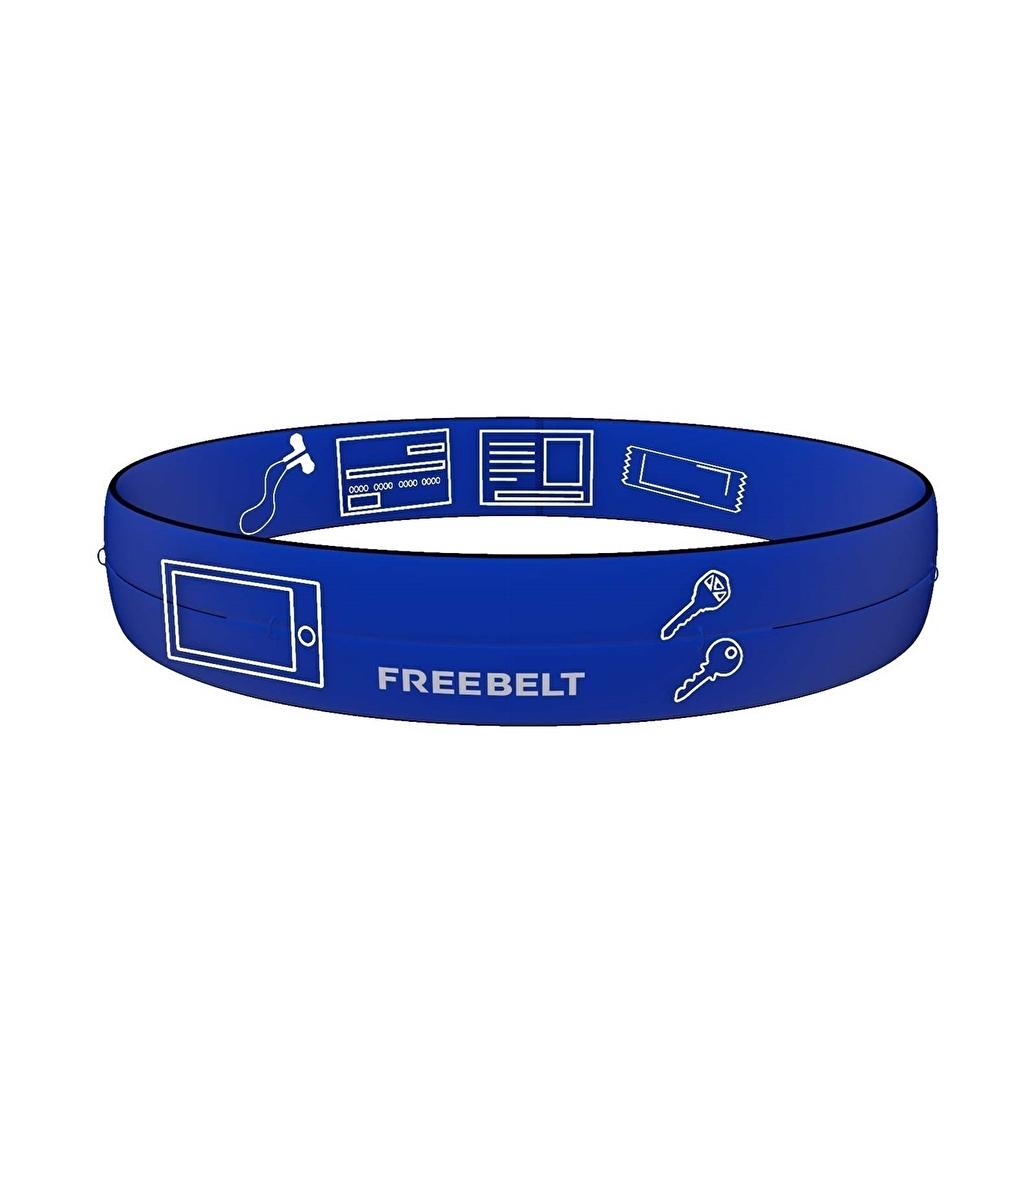 Freebelt Koşu Ve Fitness Bel Kemeri Saks Mavi